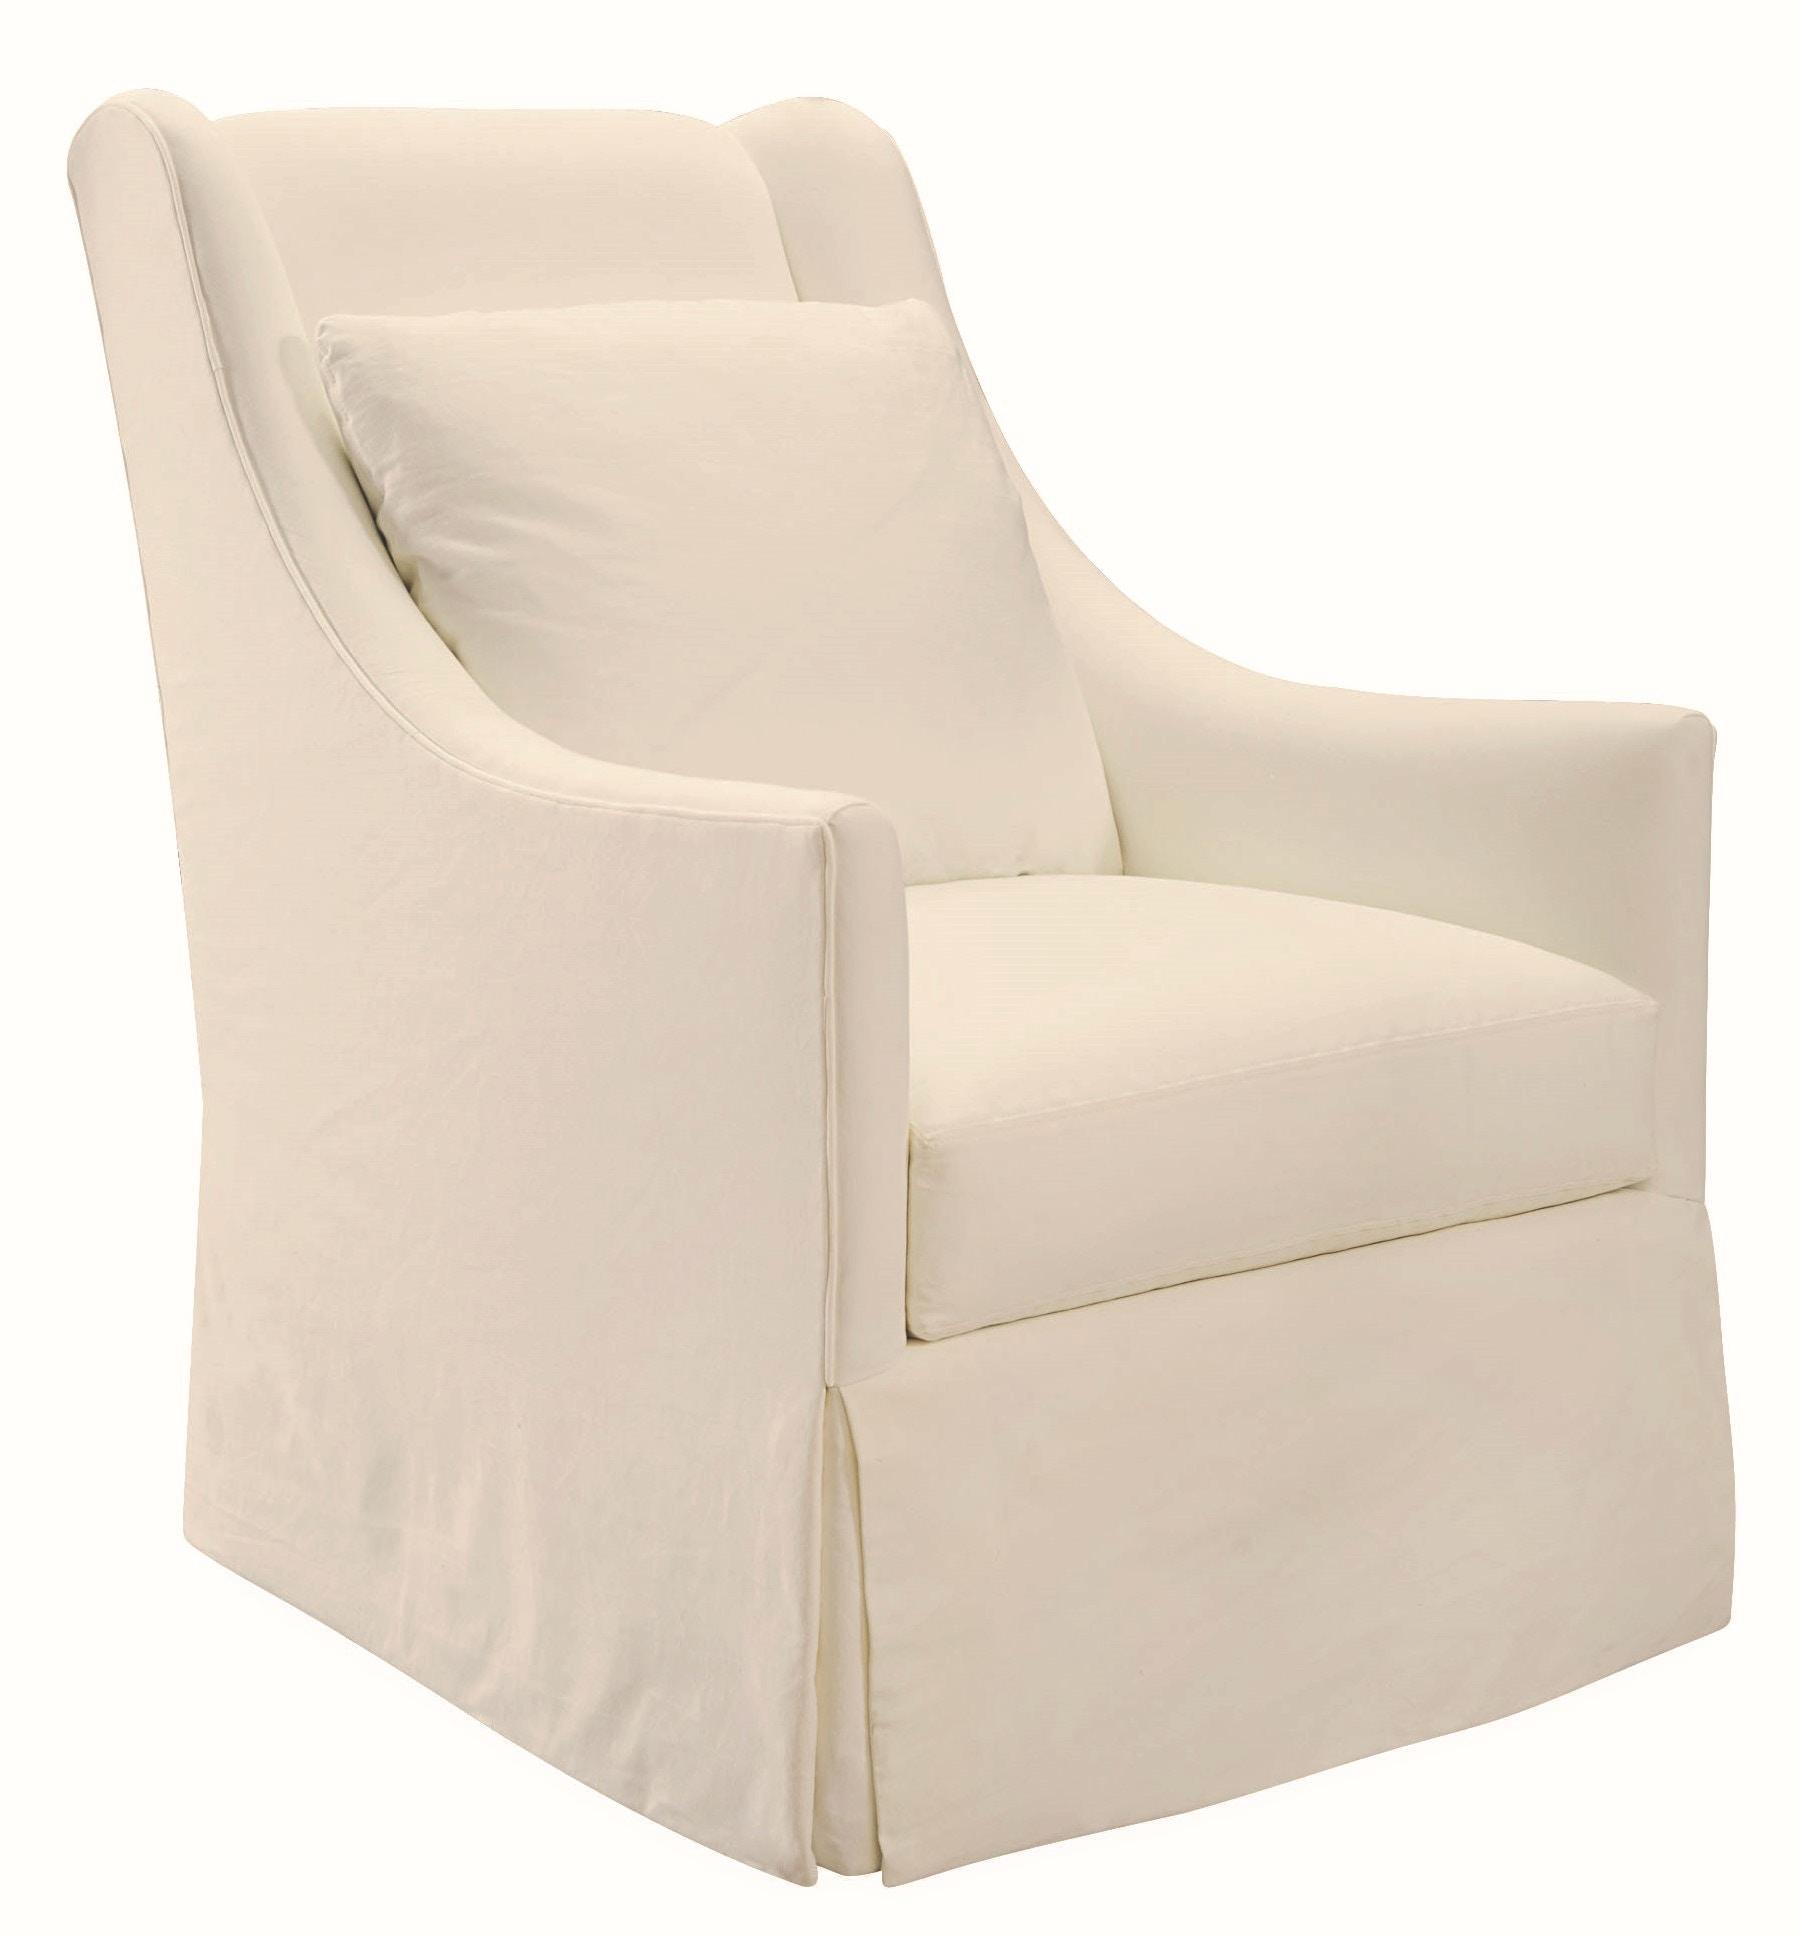 Lee Industries Swivel Chair 3471 01SW